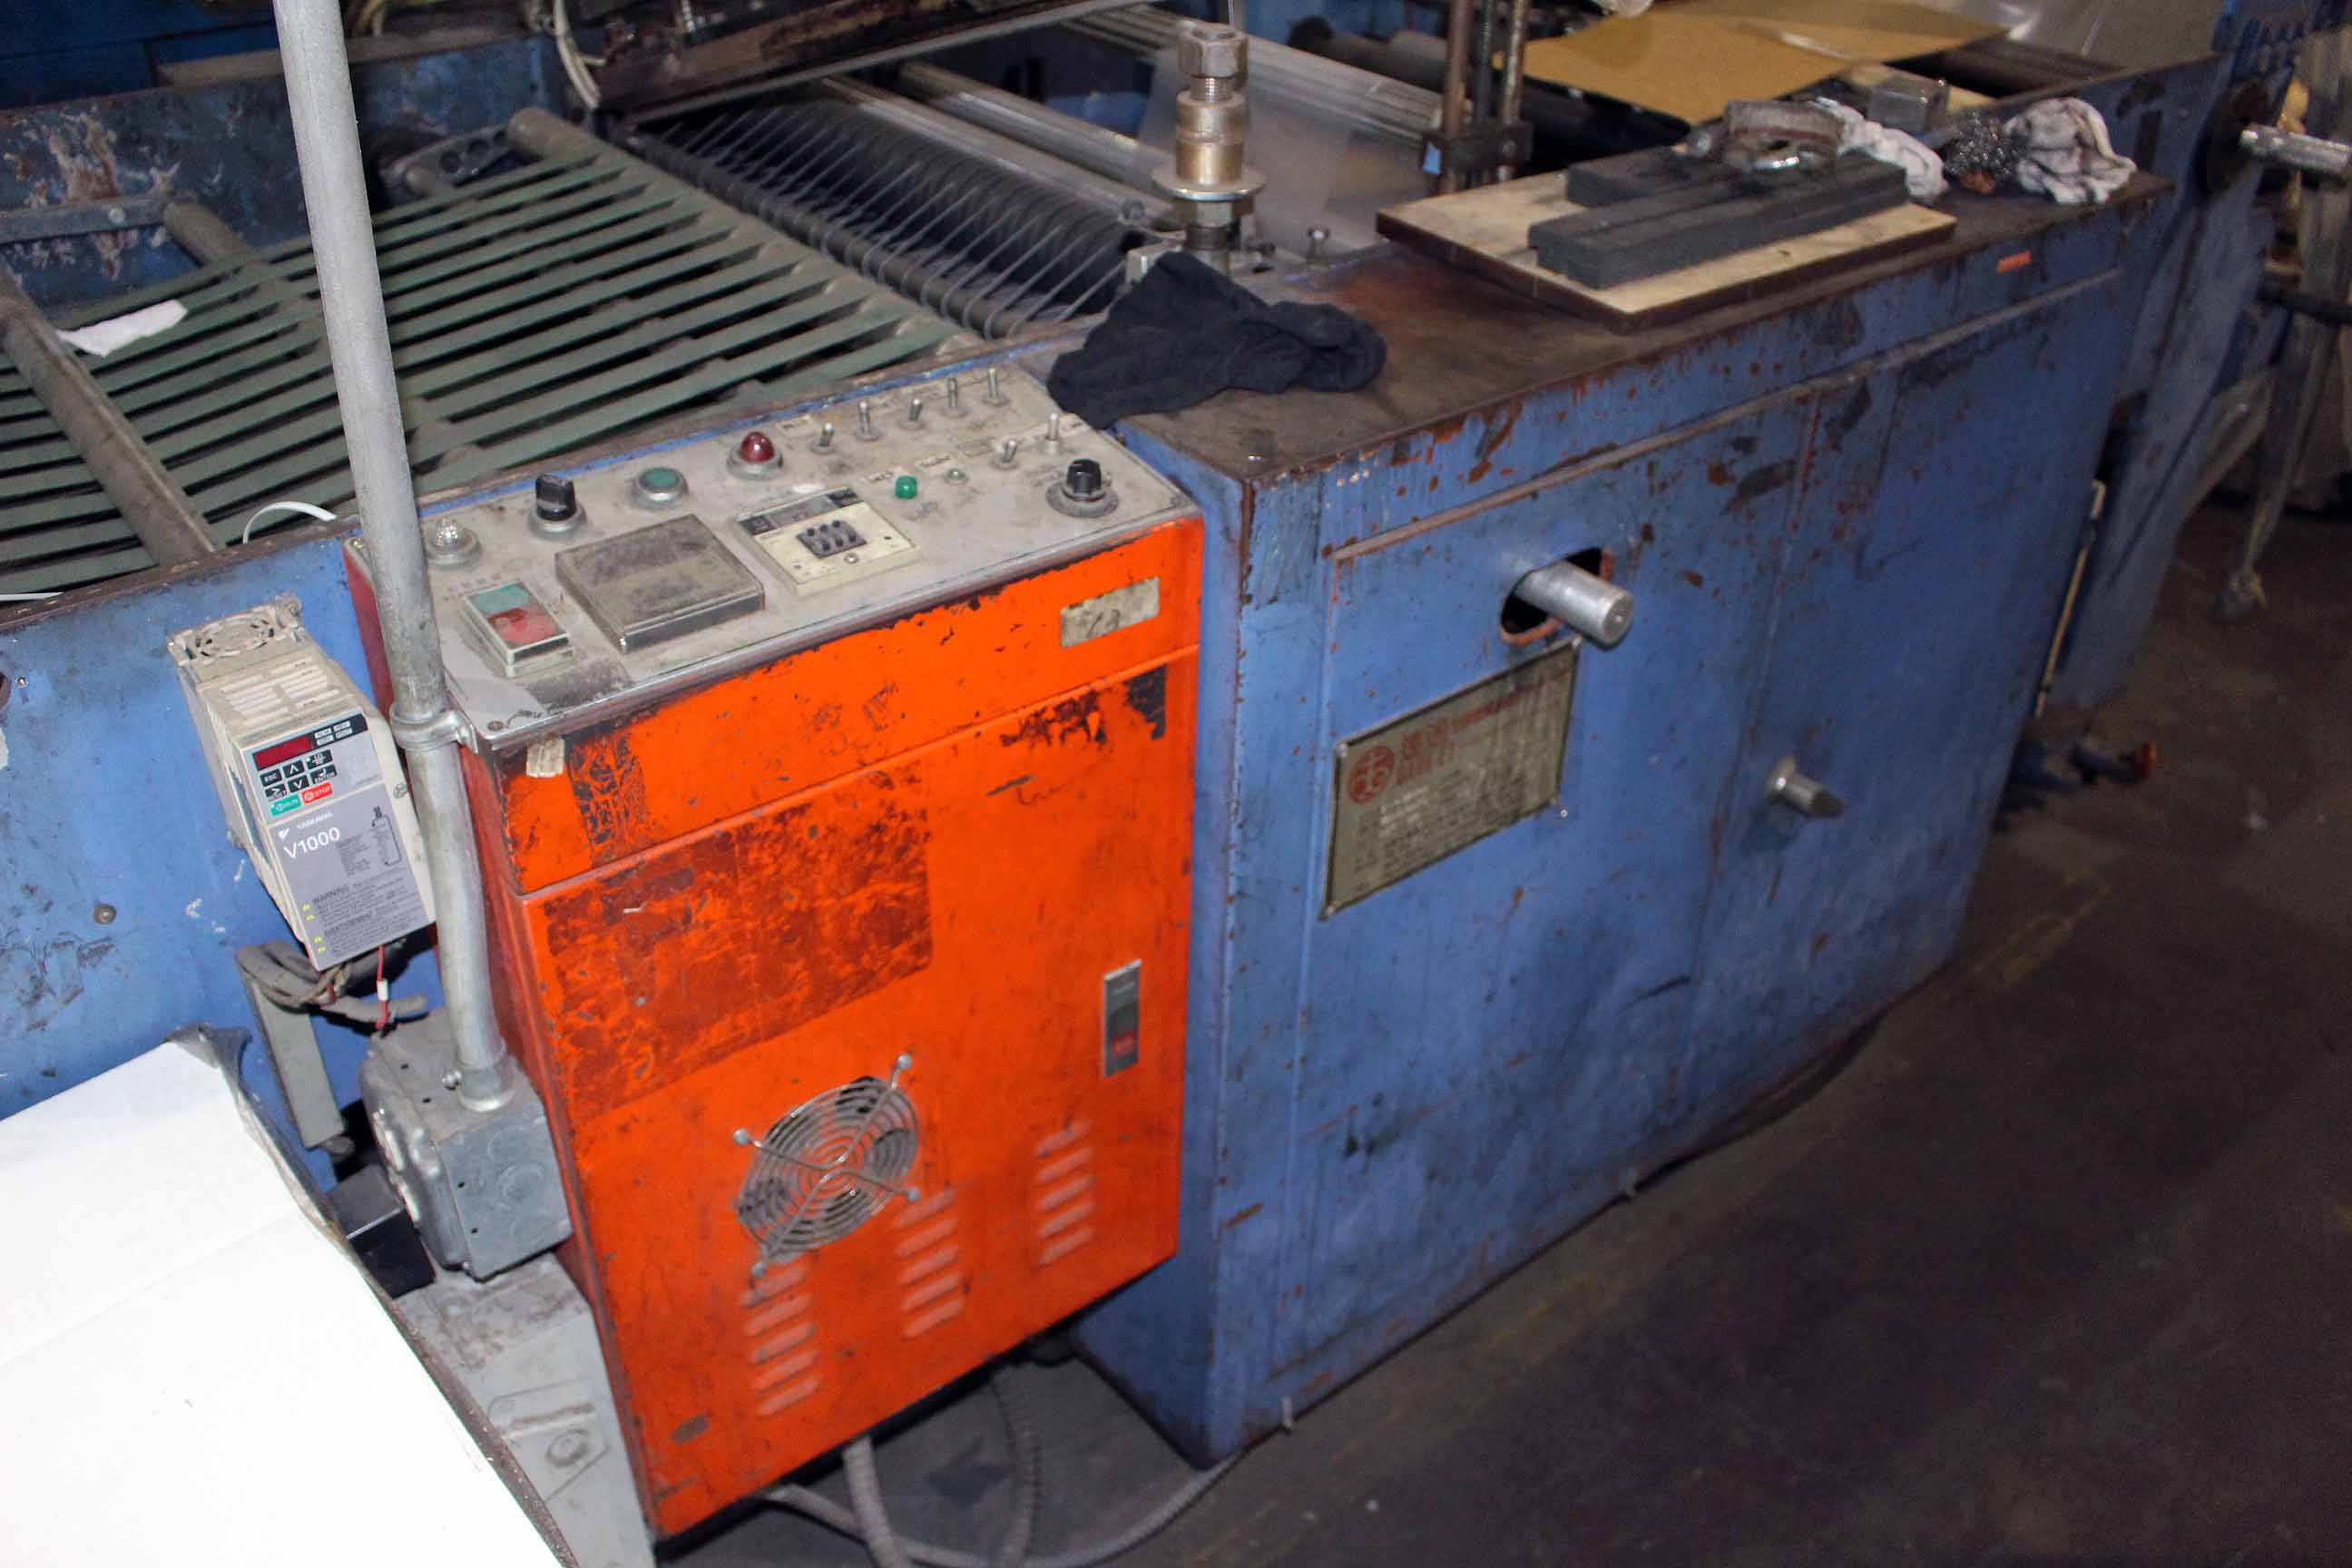 Lot 15 - SIDE/WELD MACHINE, DARE ET MDL. EV-32X50, new 1995, print sensor, S/N 320409410 (Line #3)